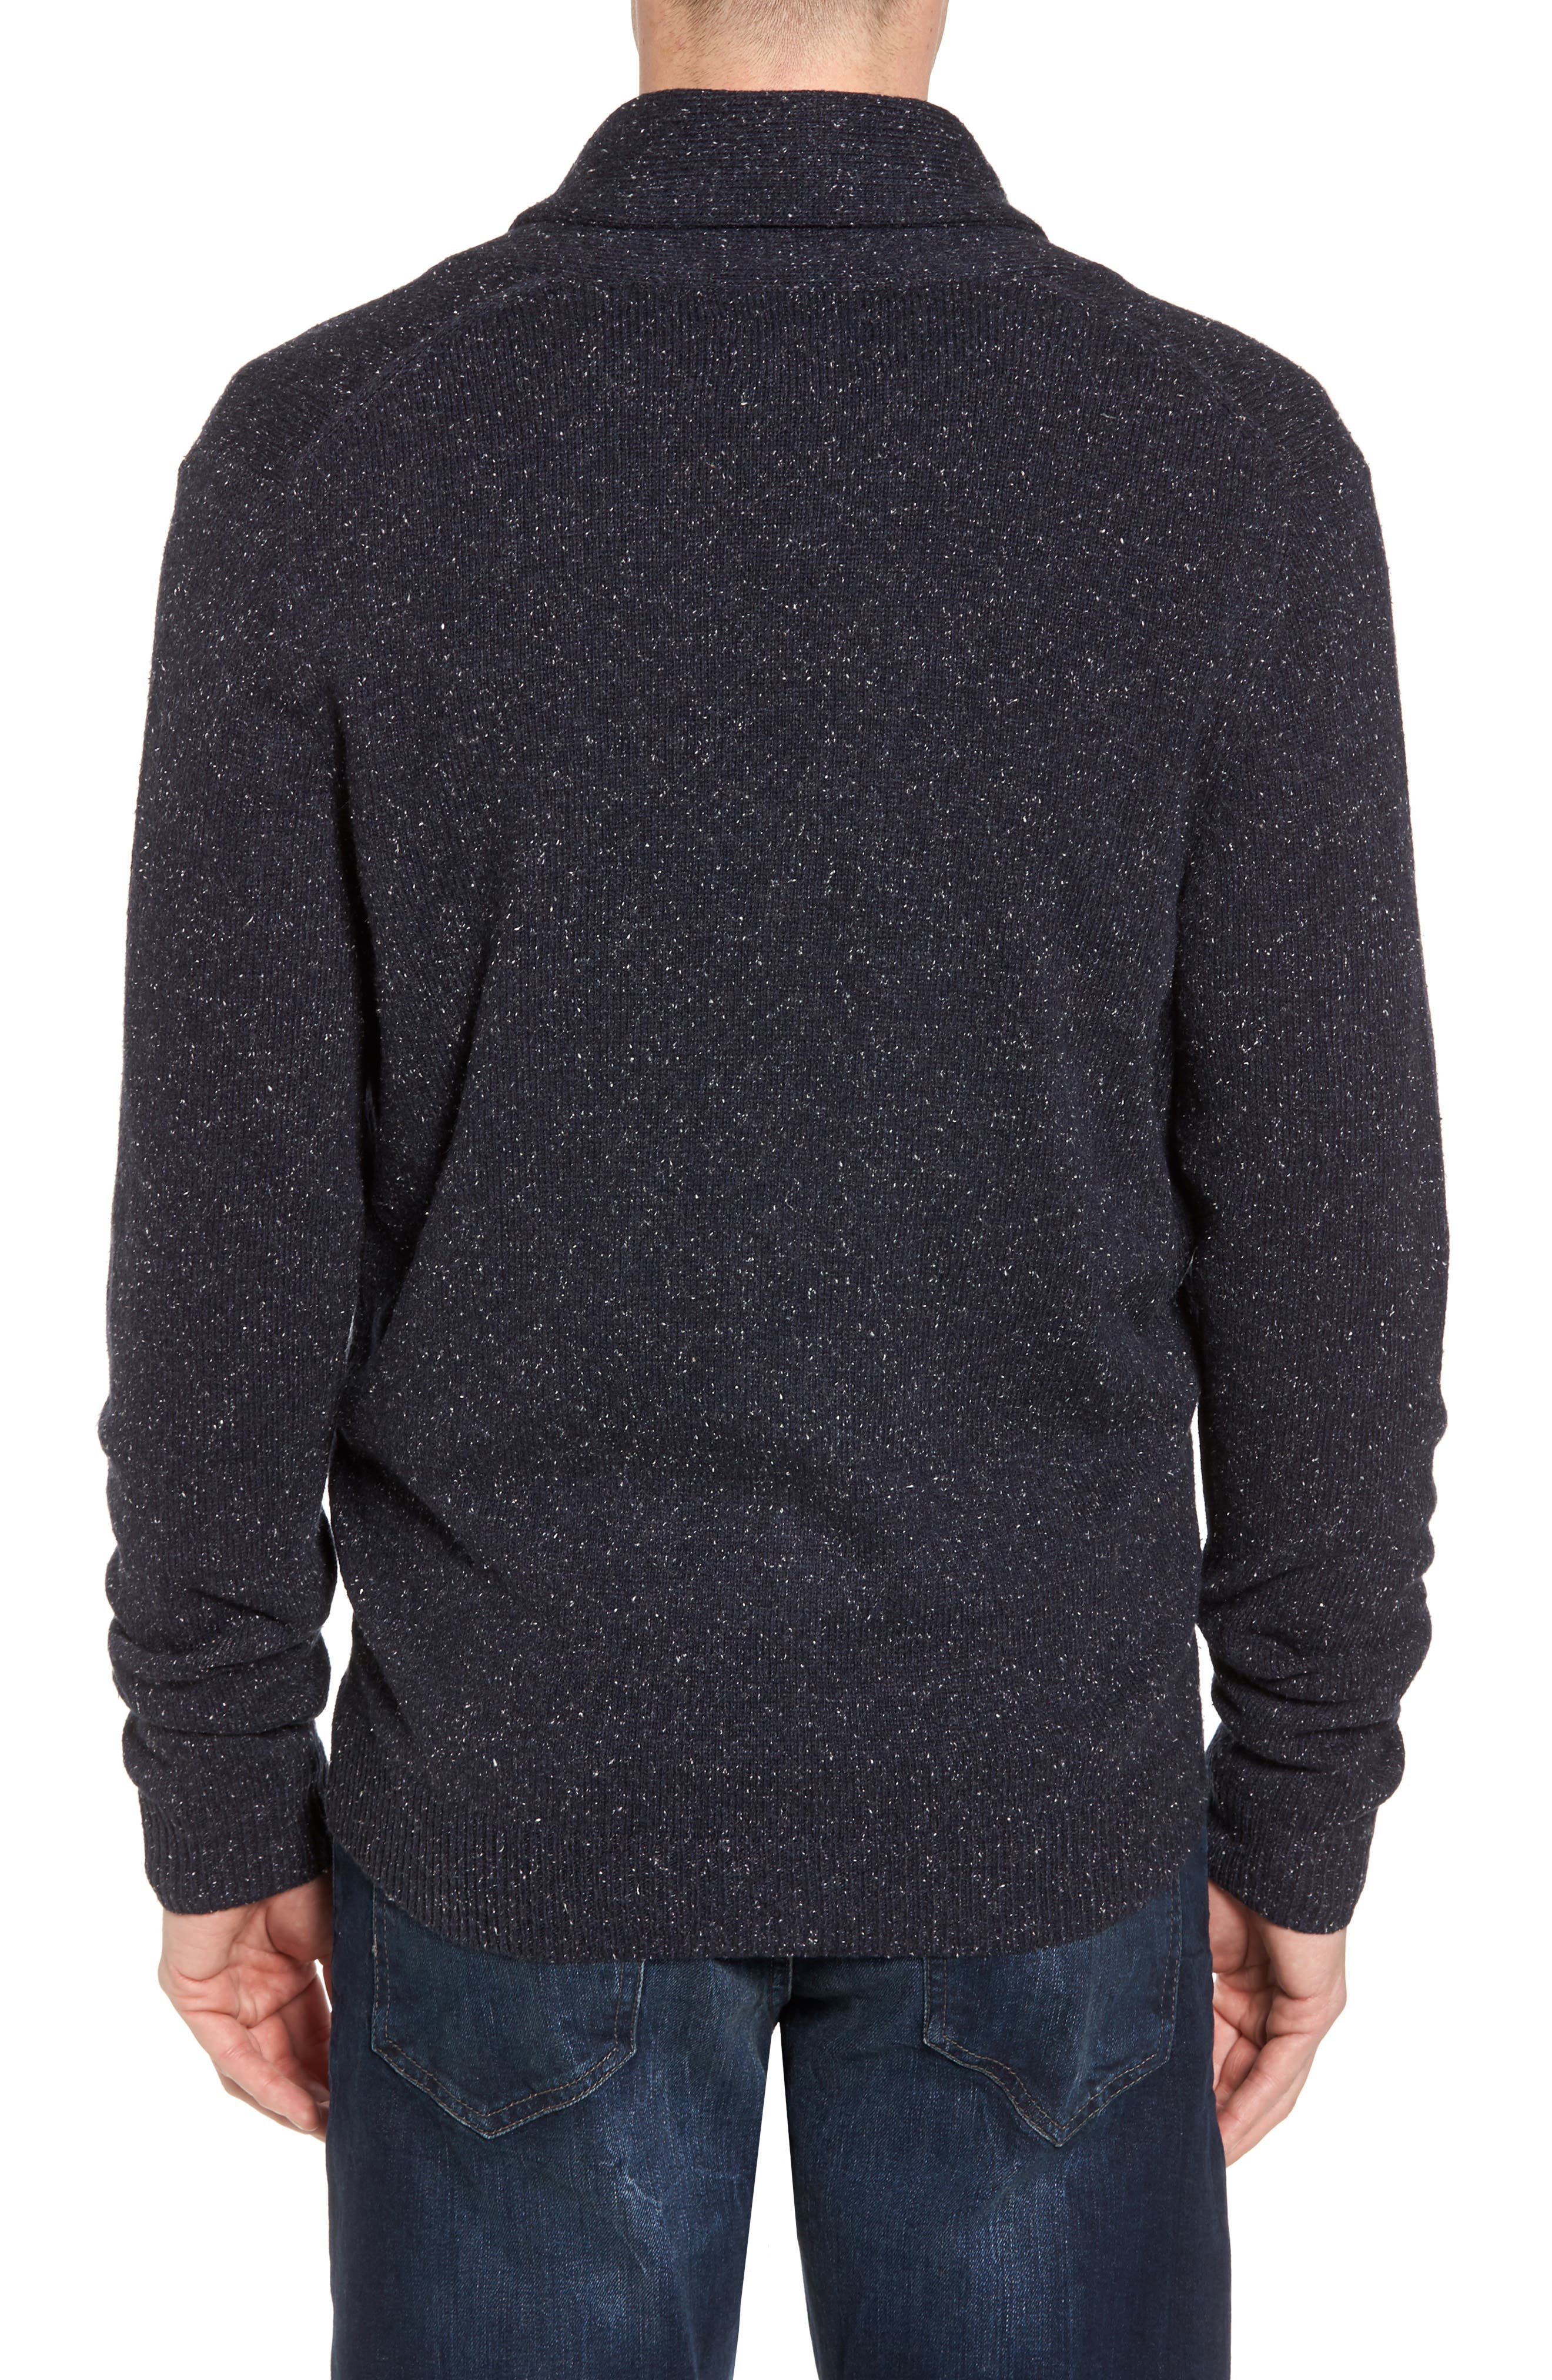 Men's Cardigan Sweaters & Jackets | Nordstrom